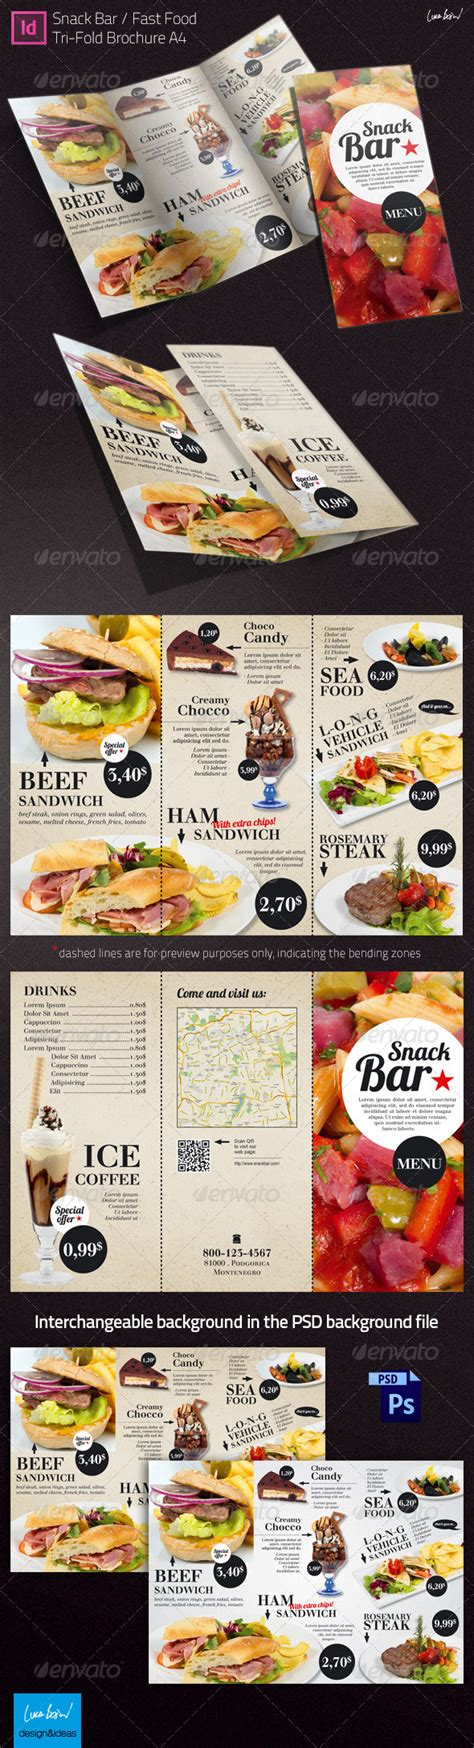 tri fold brochure snack bar menu graphicriver